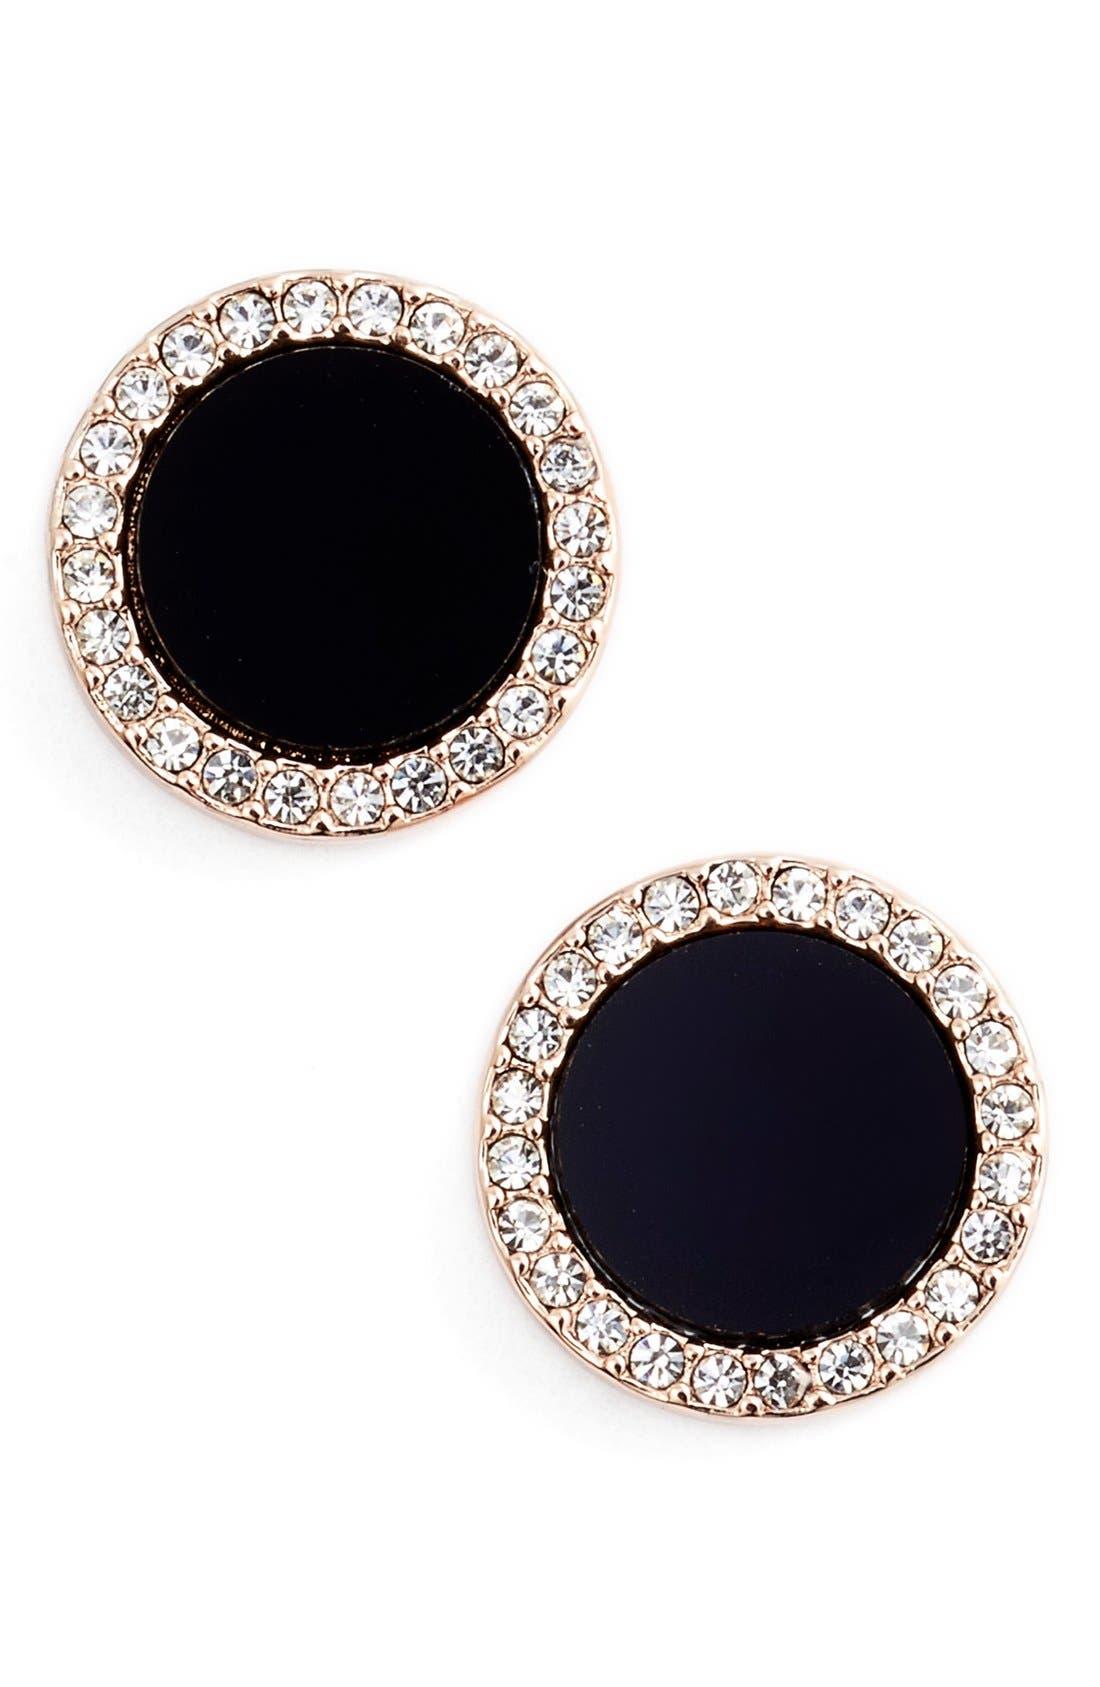 Main Image - kate spade new york 'in the spotlight' circular stud earrings